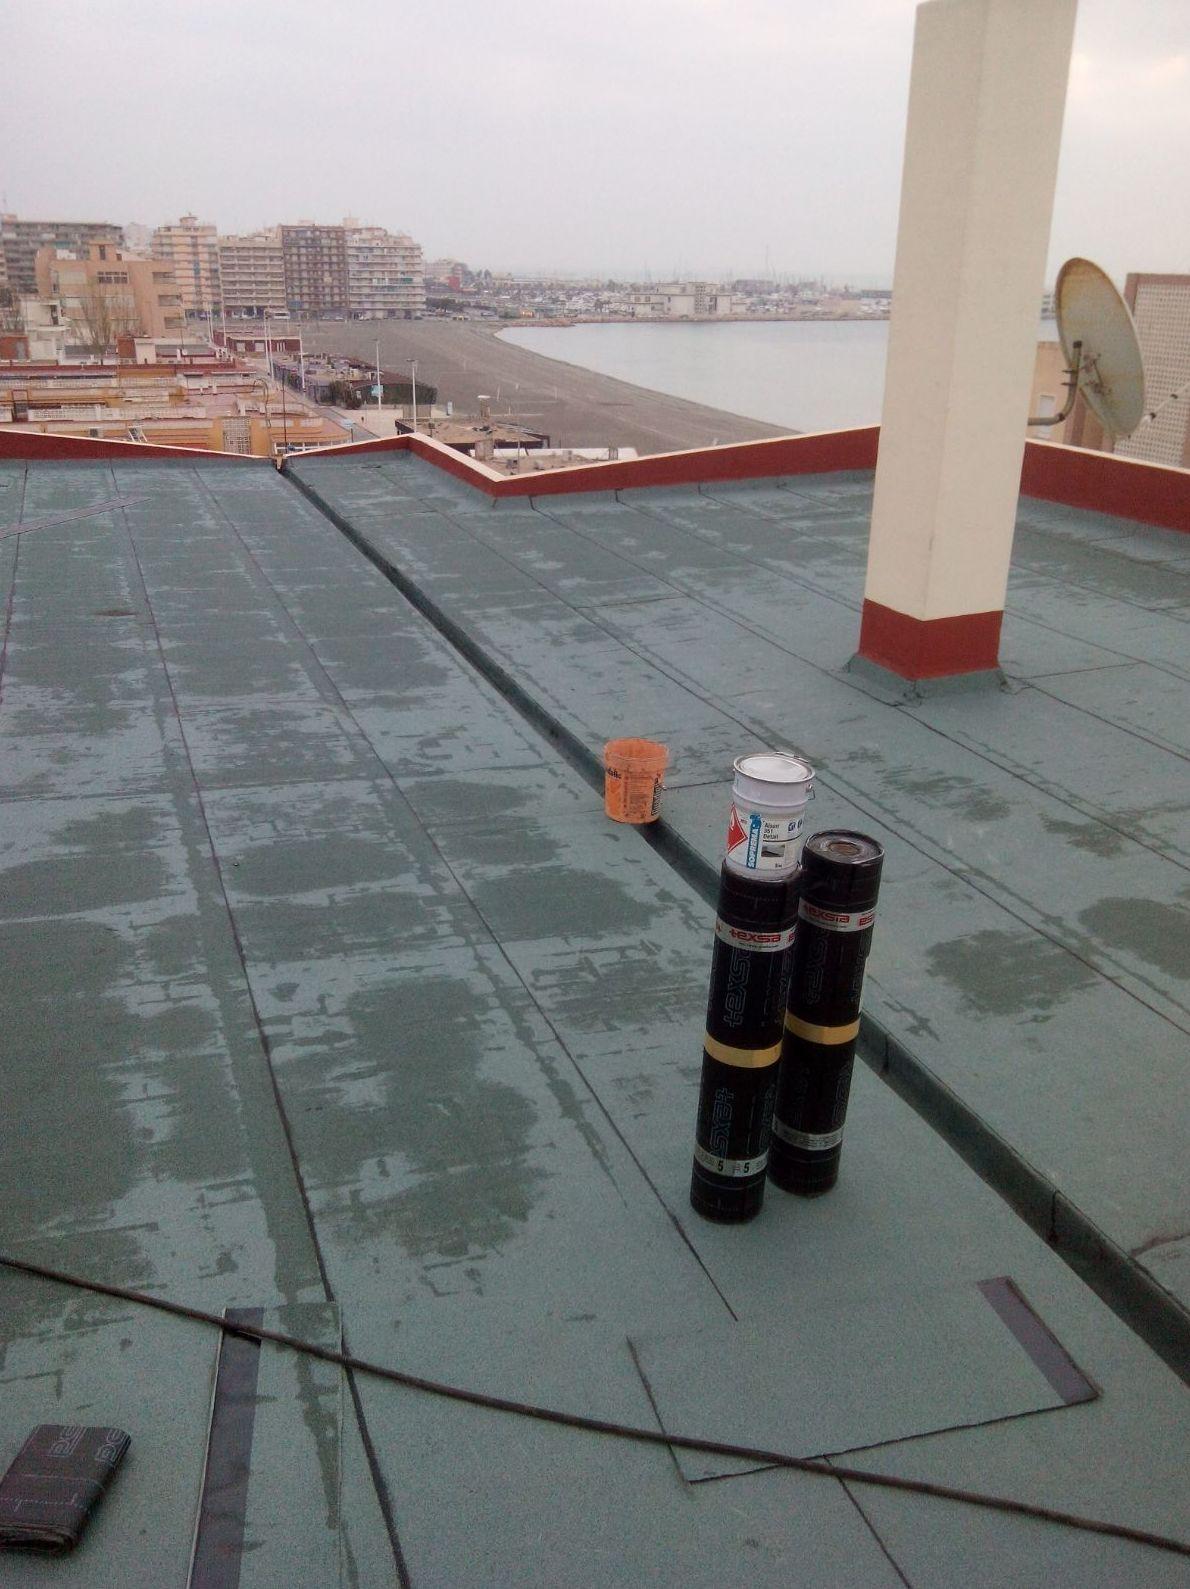 Rehabilitació cubierta edificio en Santa Pola (Alicante)